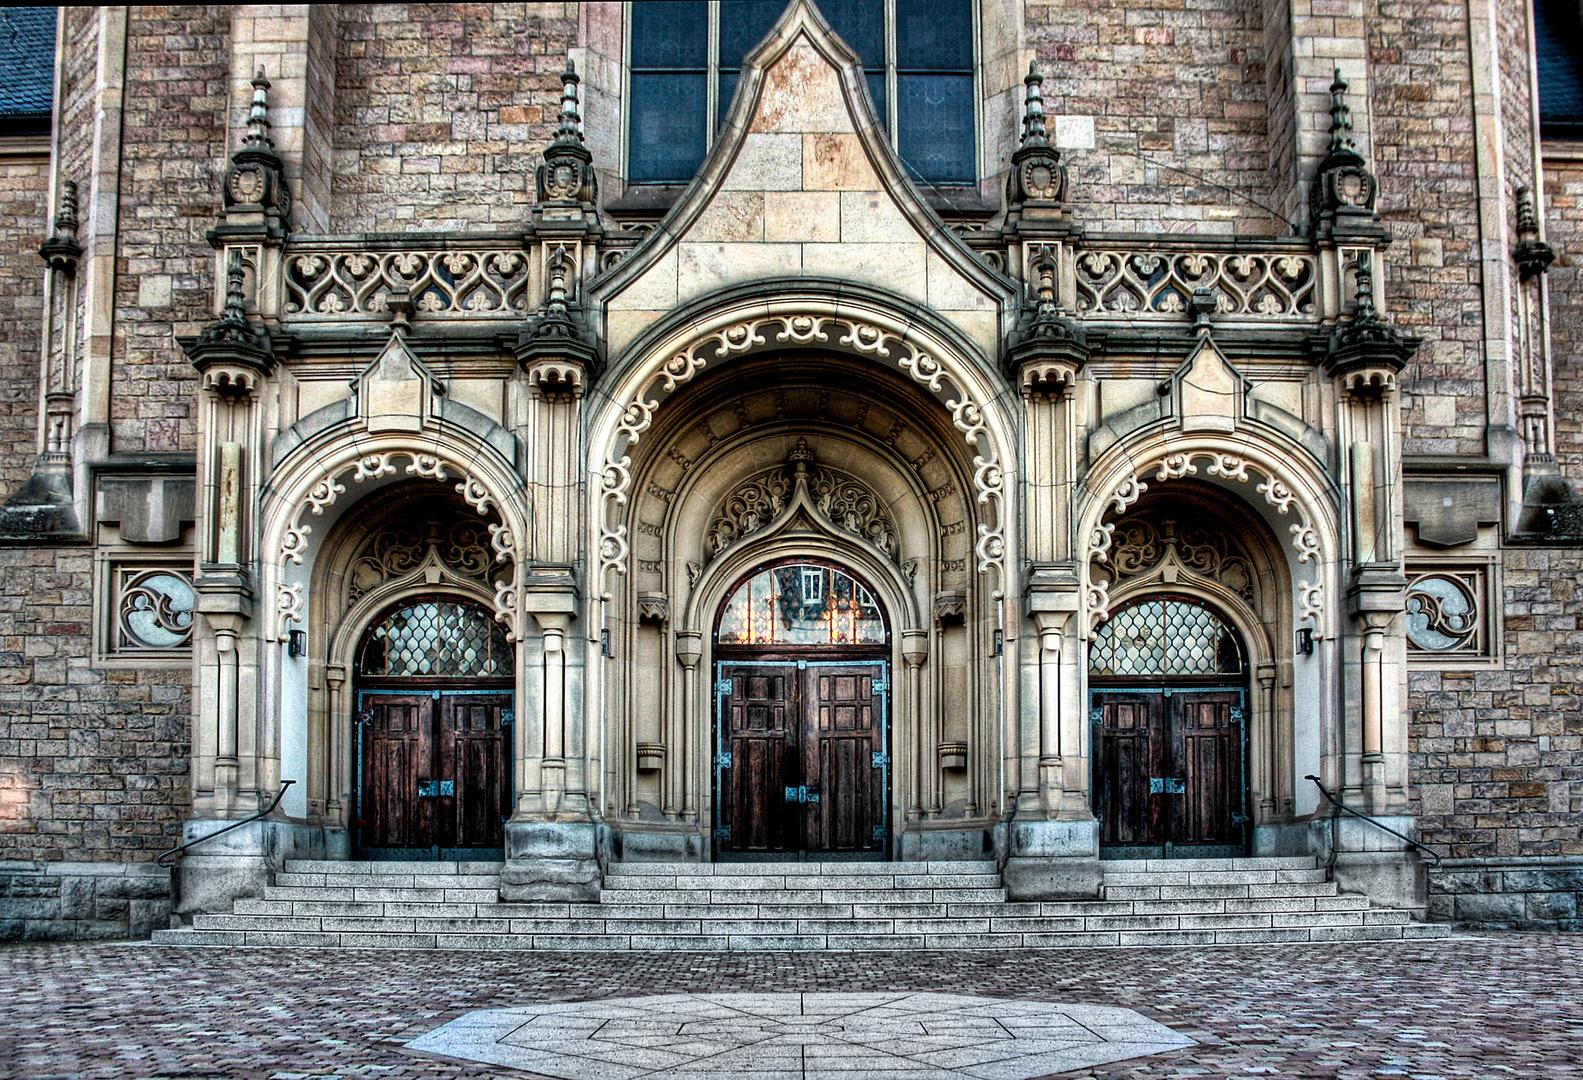 Kirche in Speyer HDR